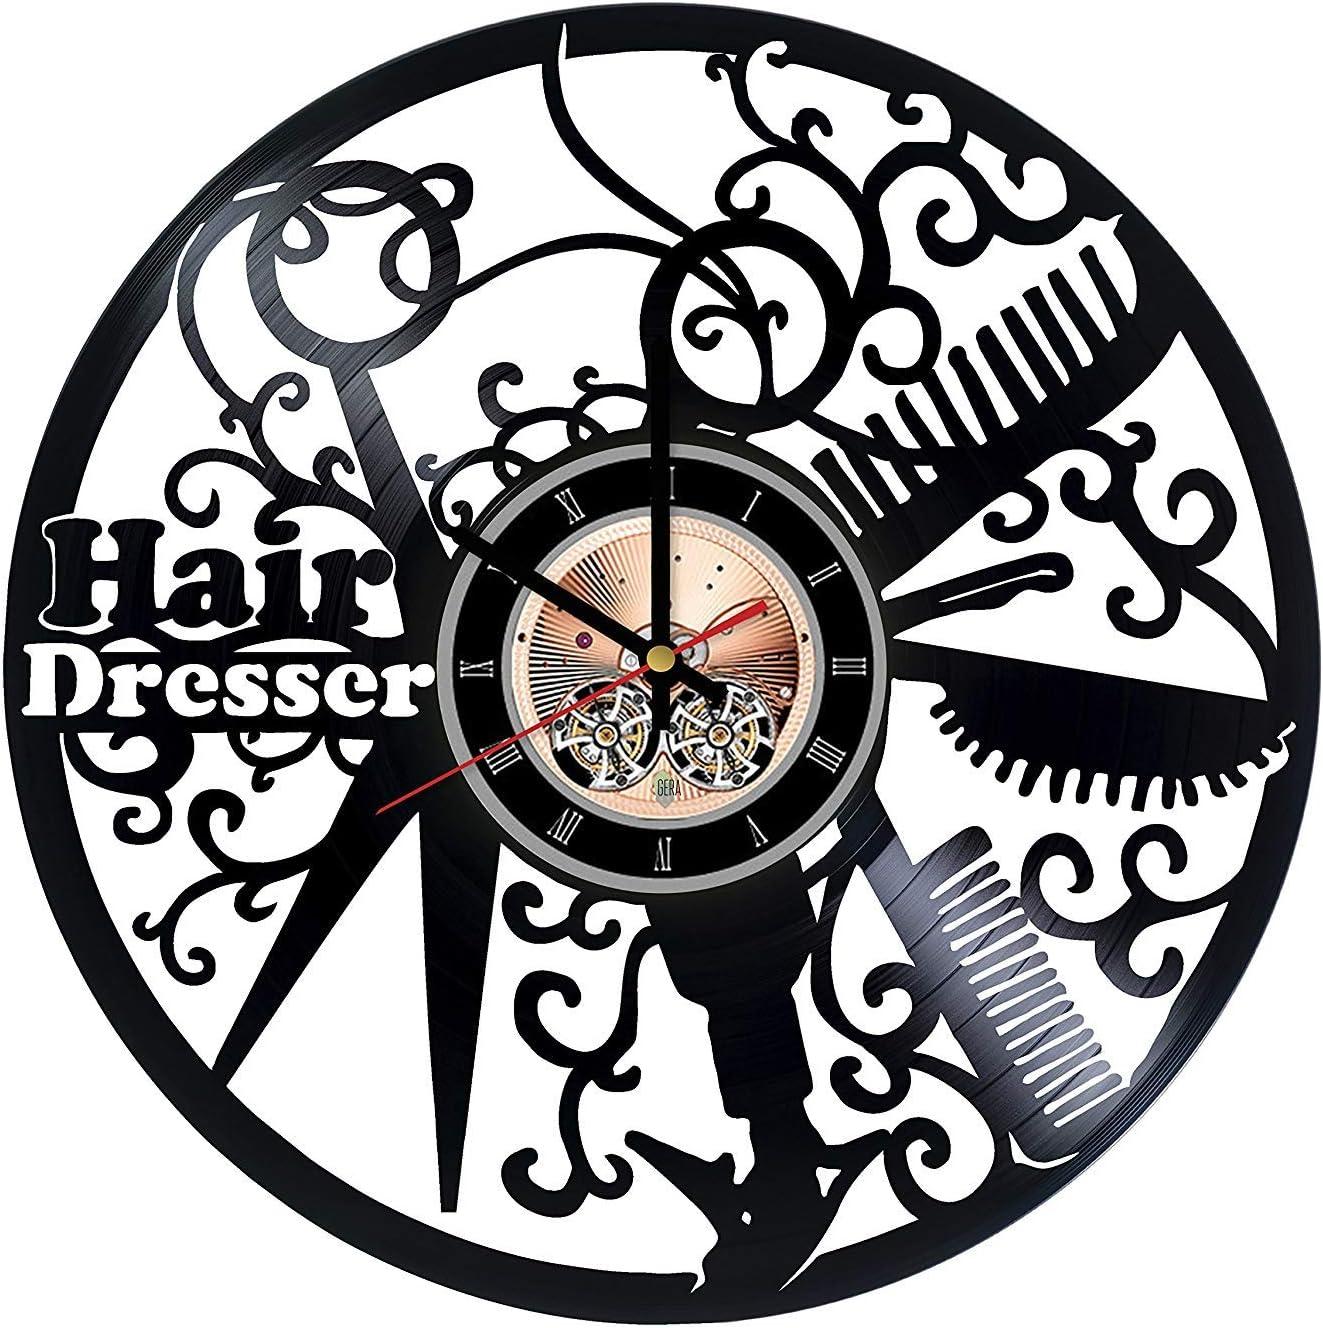 Hair Salon Handmade Vinyl Record Wall Clock - Home Room or Bathroom Wall Decor - Gift Ideas for Men and Women, Girls, Mother – Beautiful Unique Art Design